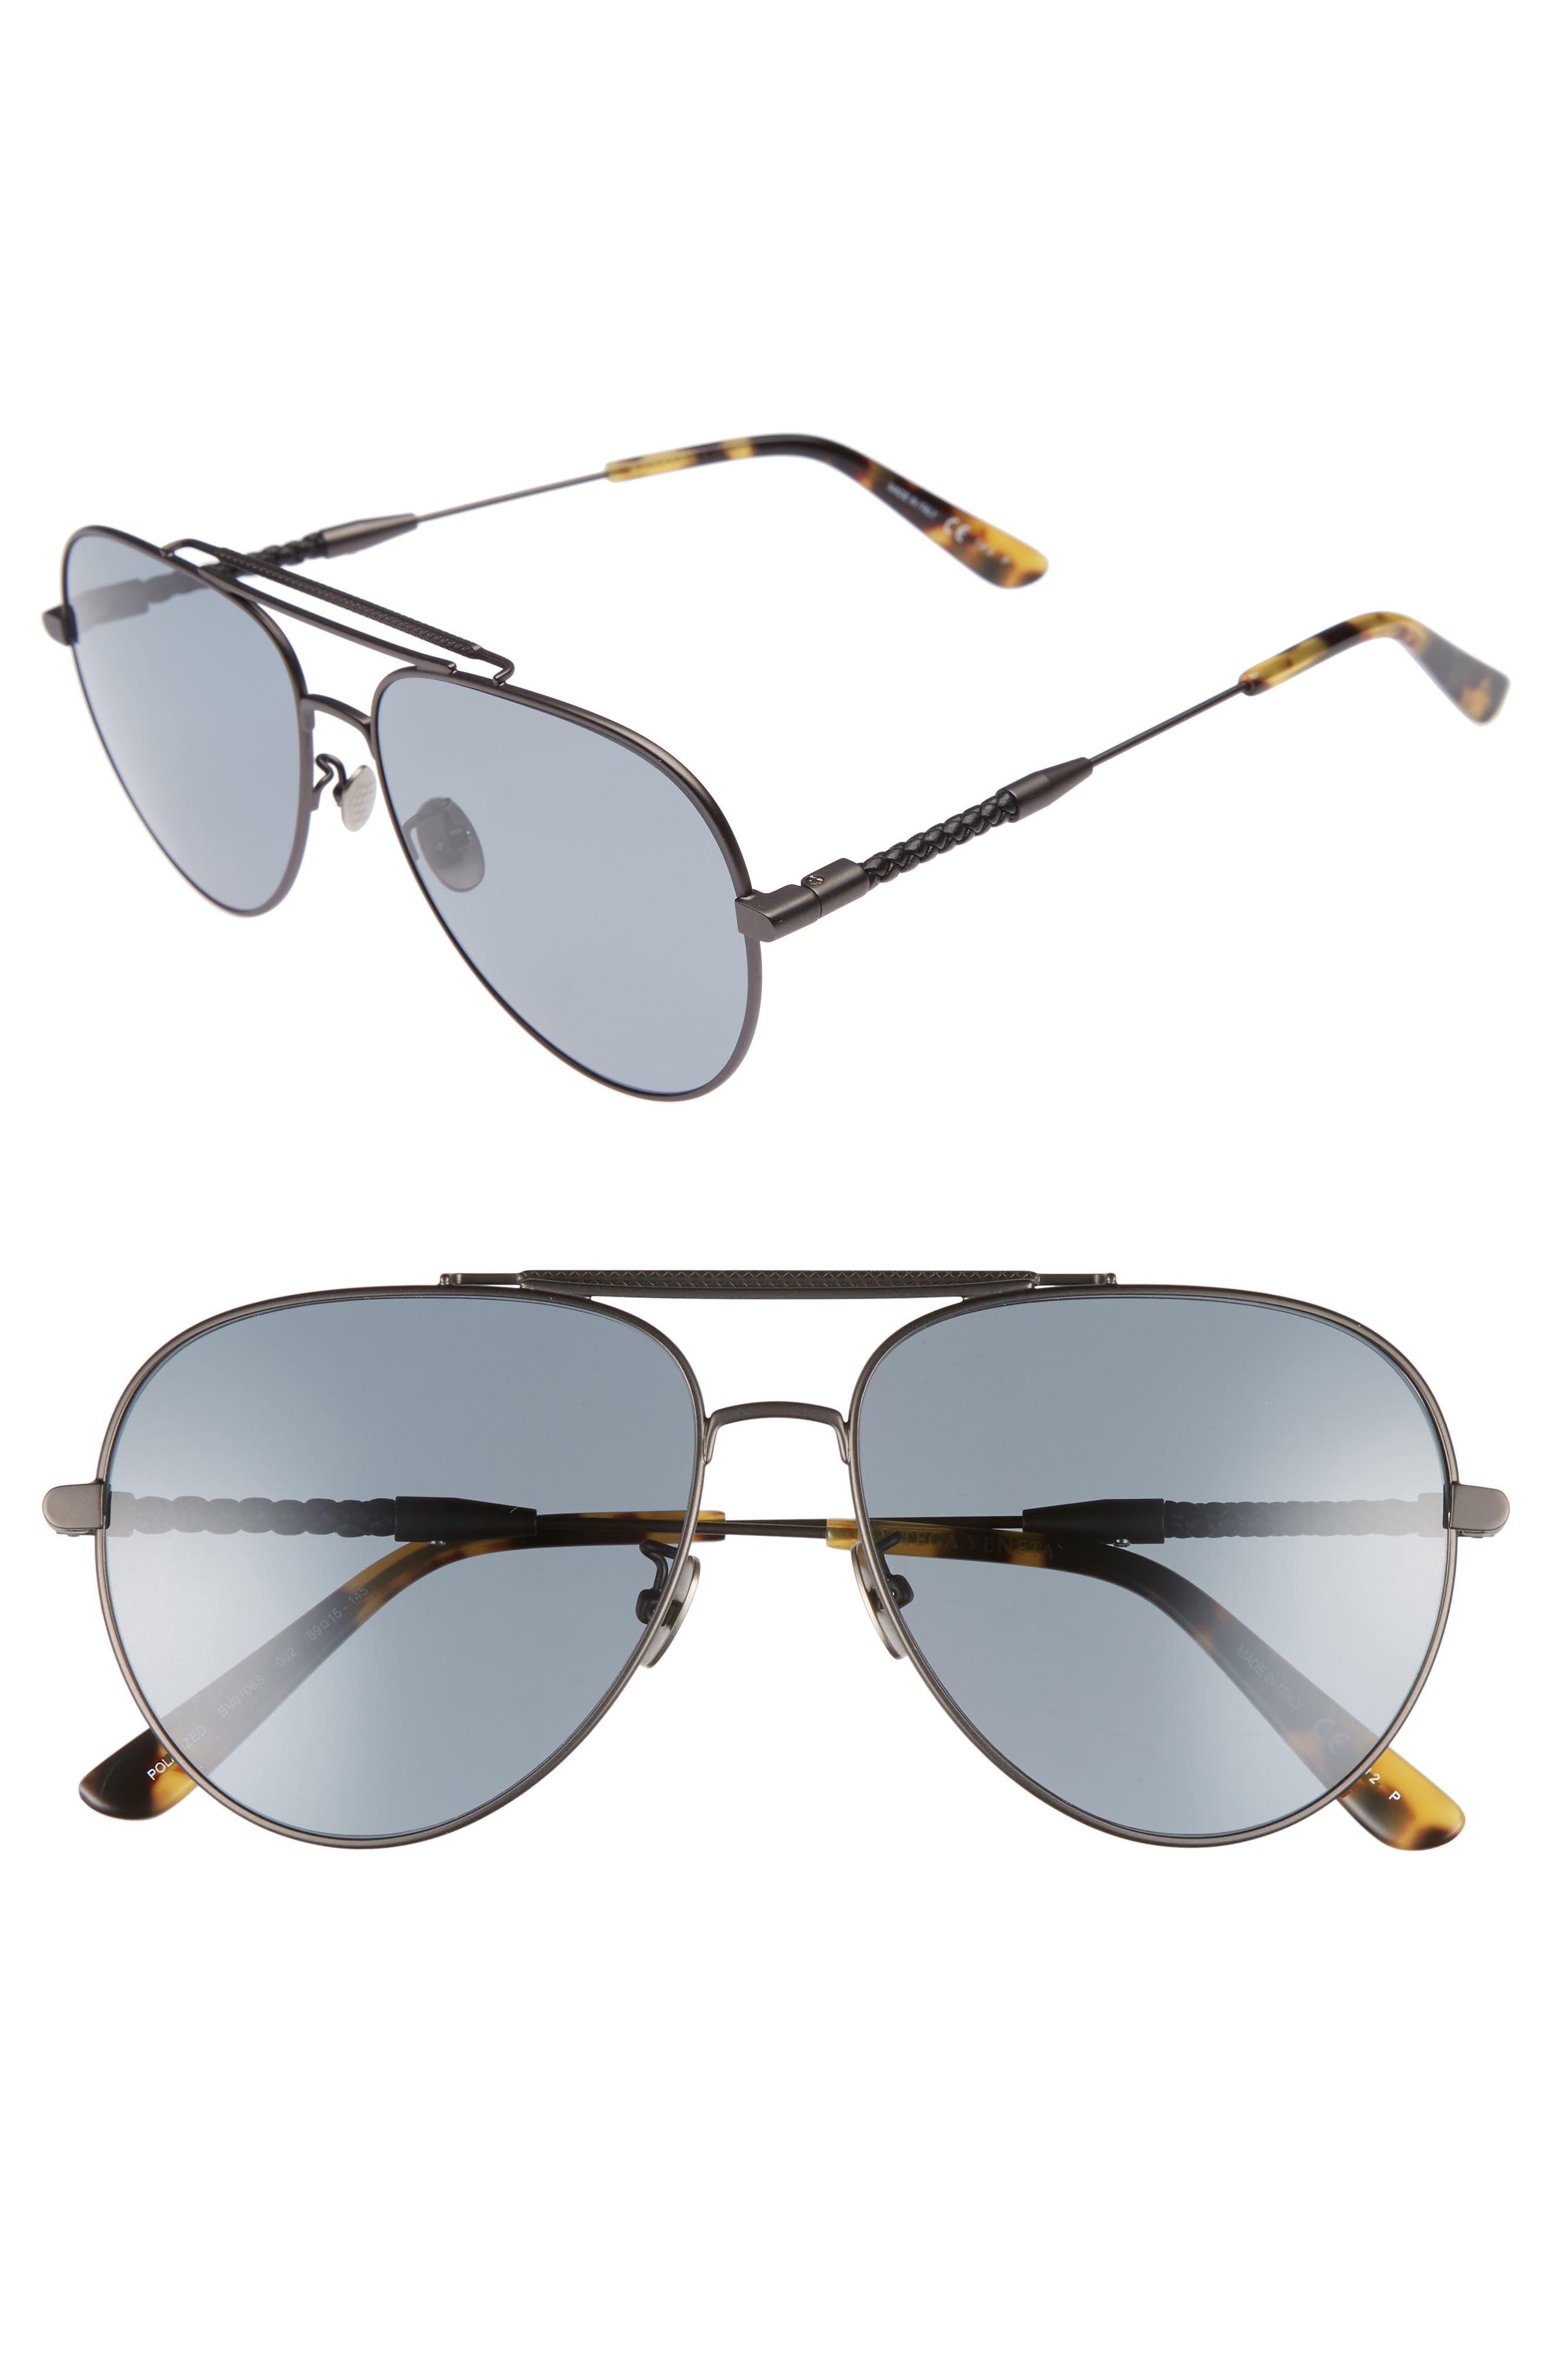 Bottega Veneta 59m Polarized Aviator Sunglasses